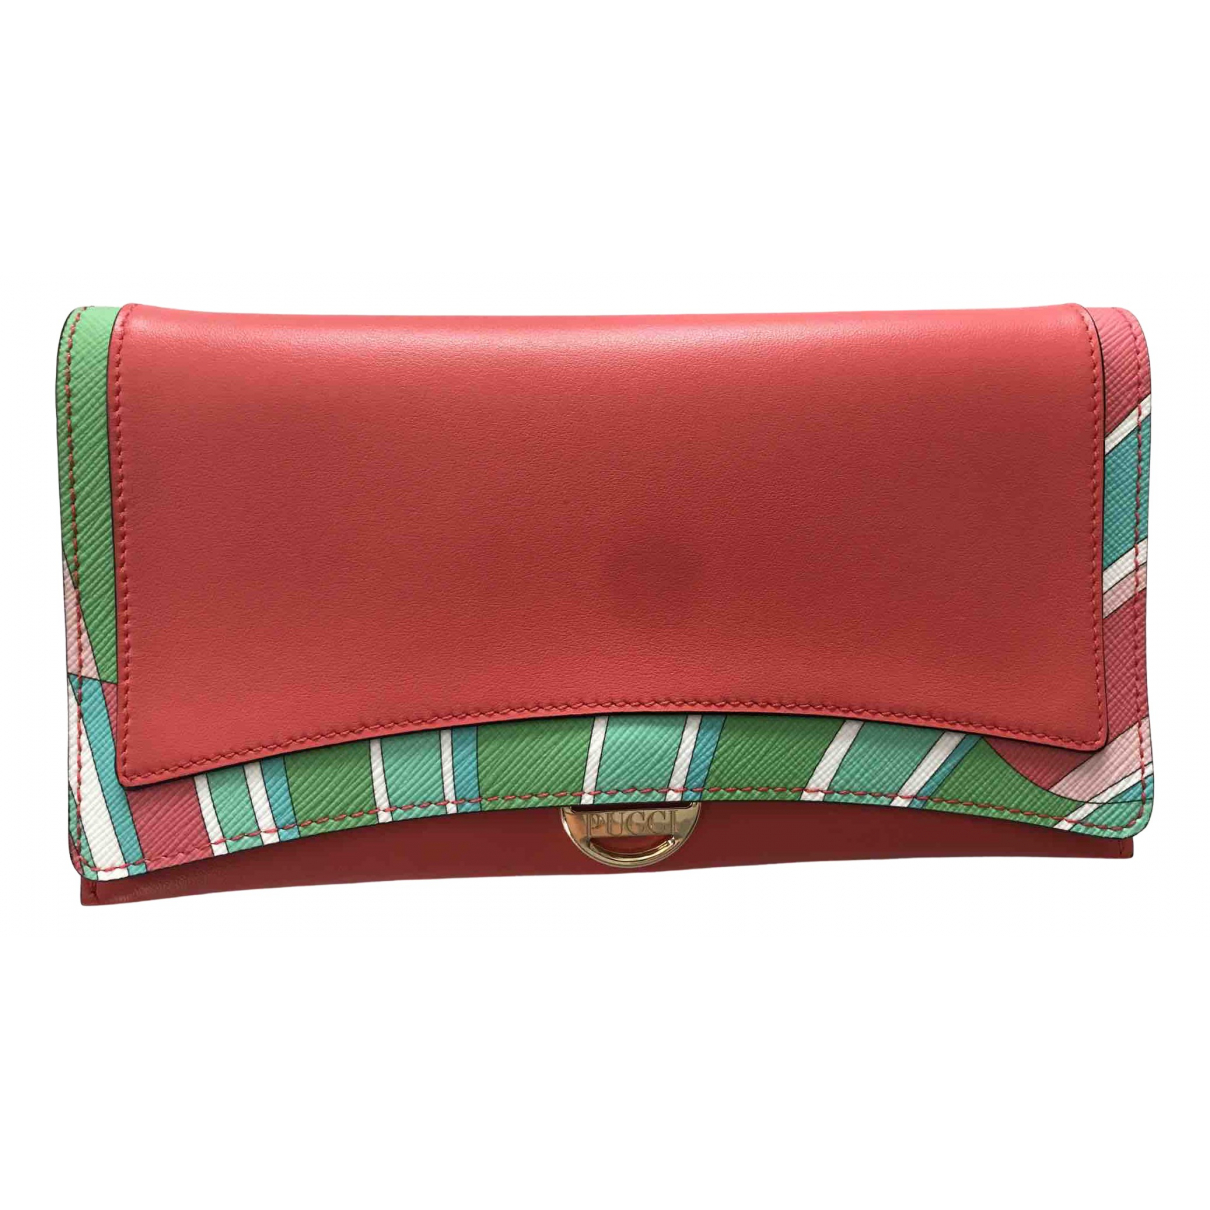 Emilio Pucci N Orange Leather wallet for Women N